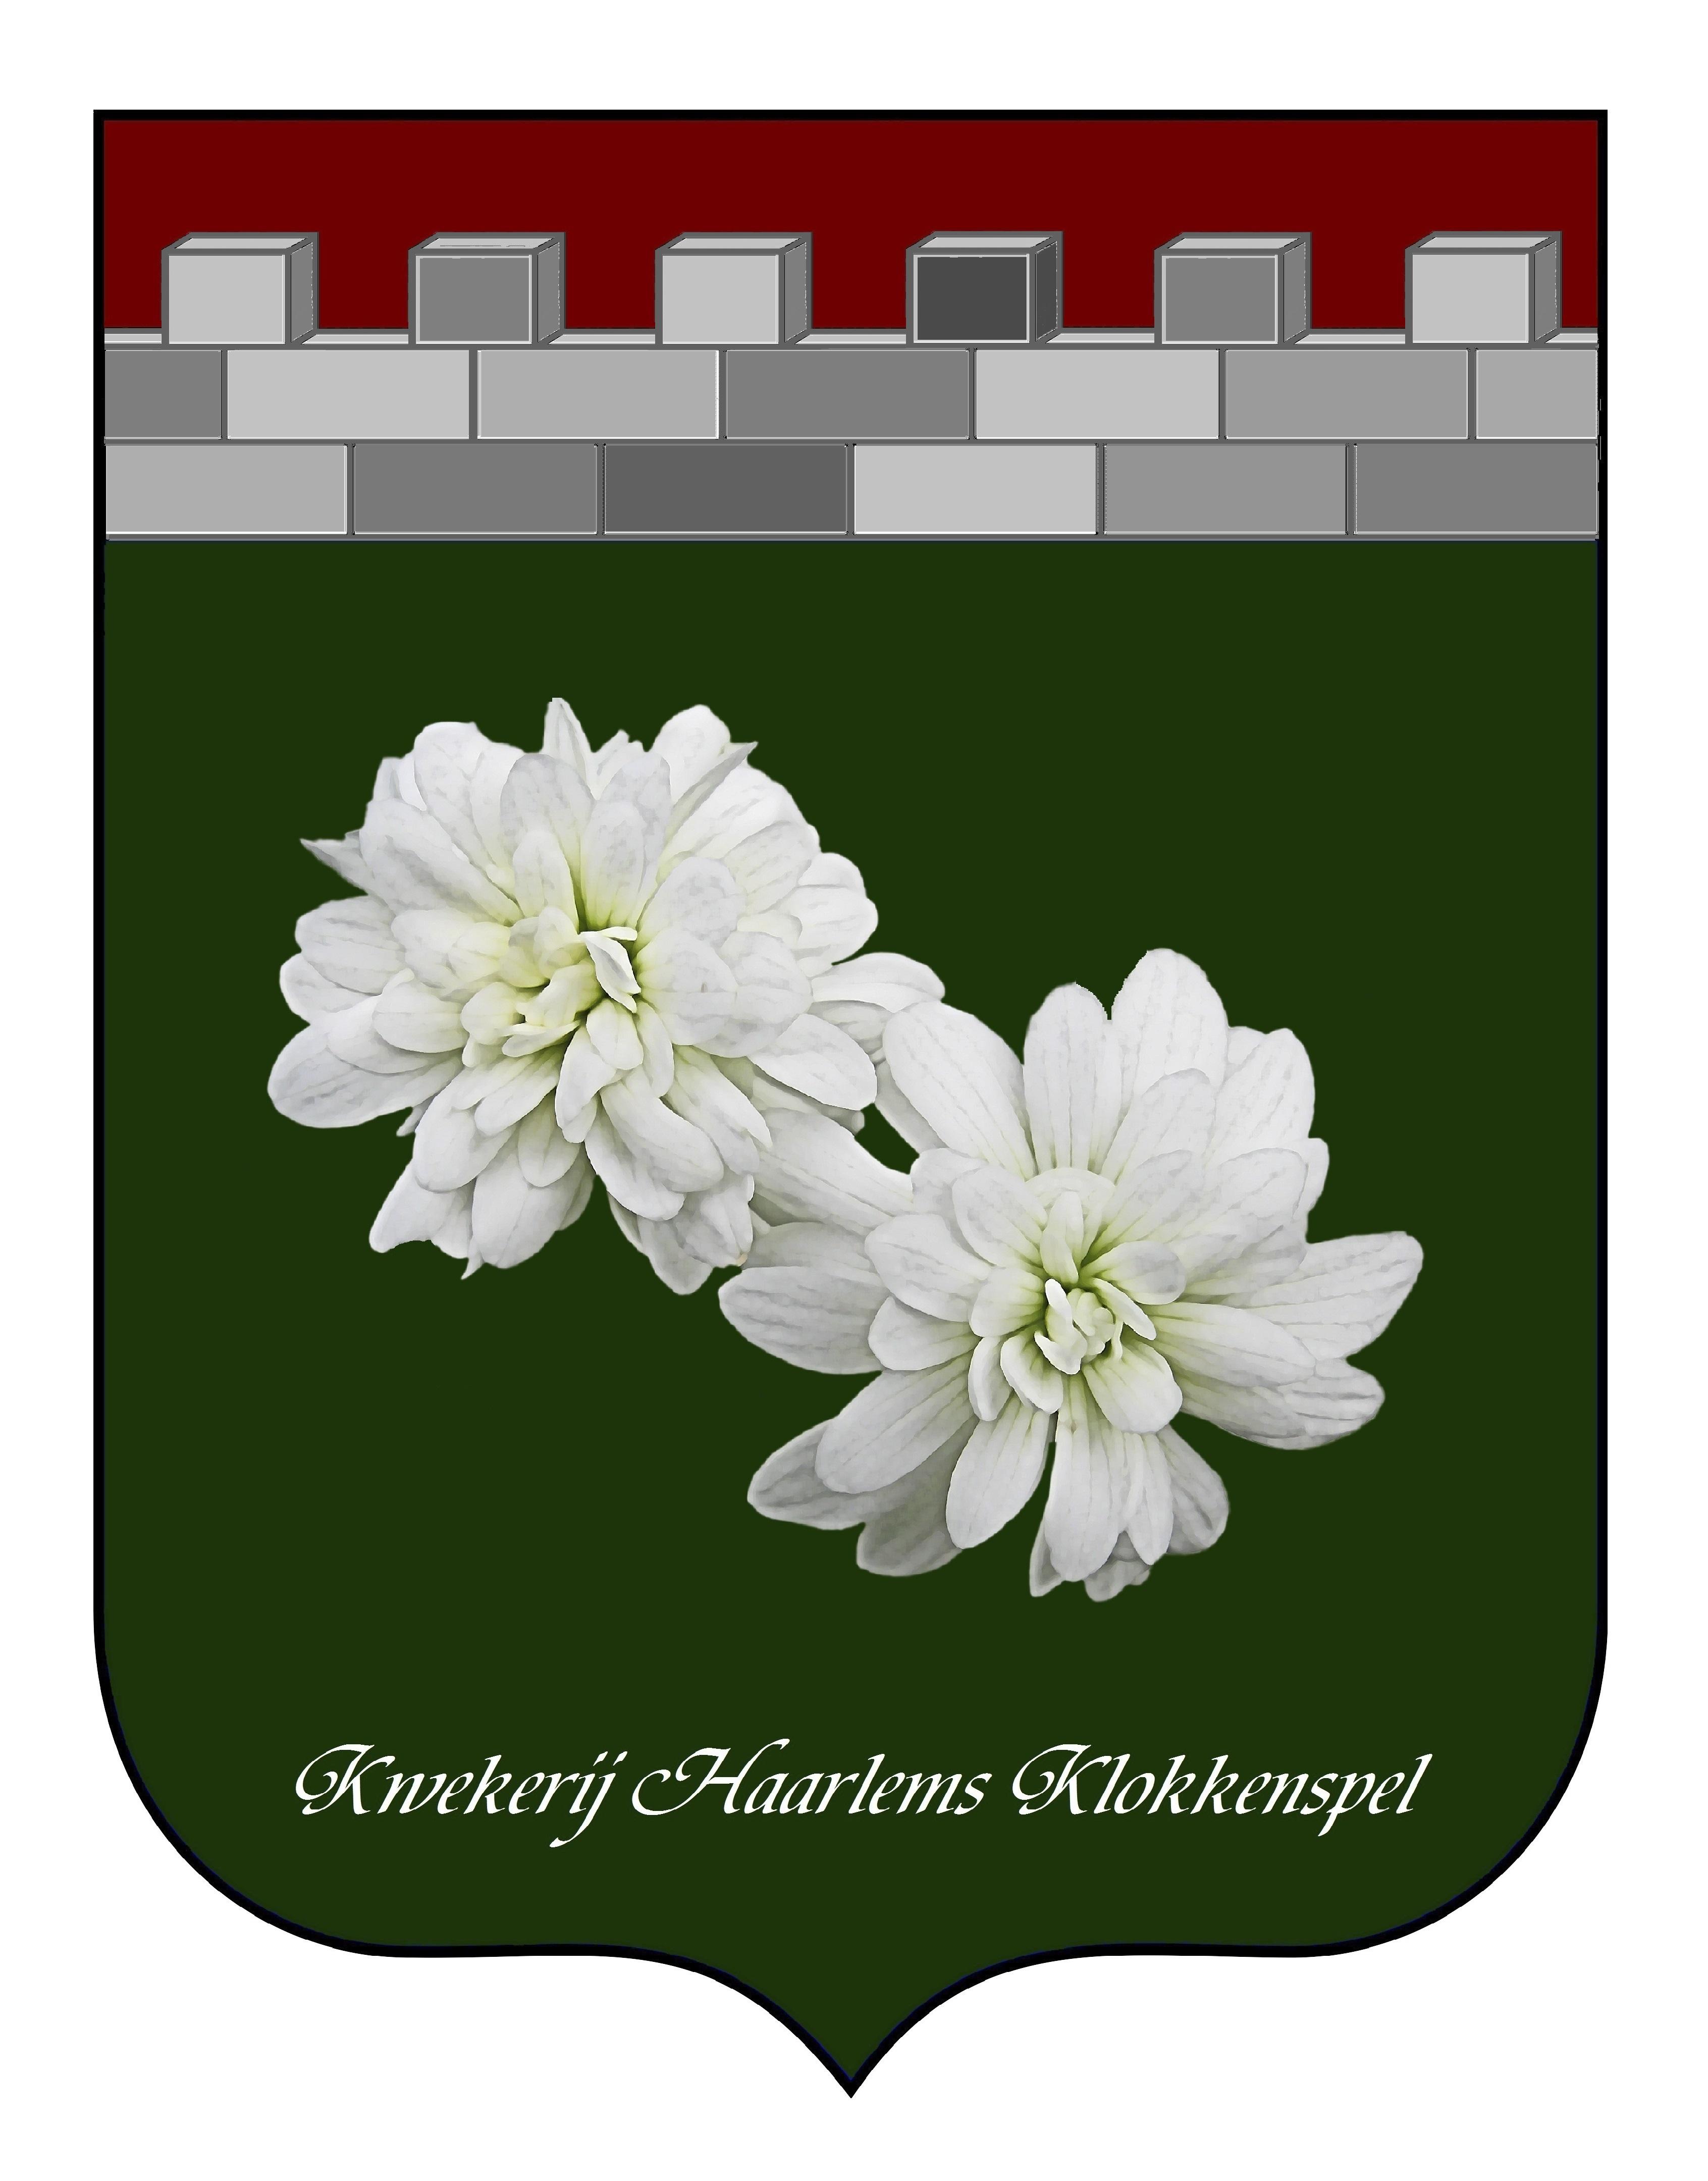 Haarlems Klokkenspel, saxifraga granulata plena, stinzenplant, knolsteenbreek